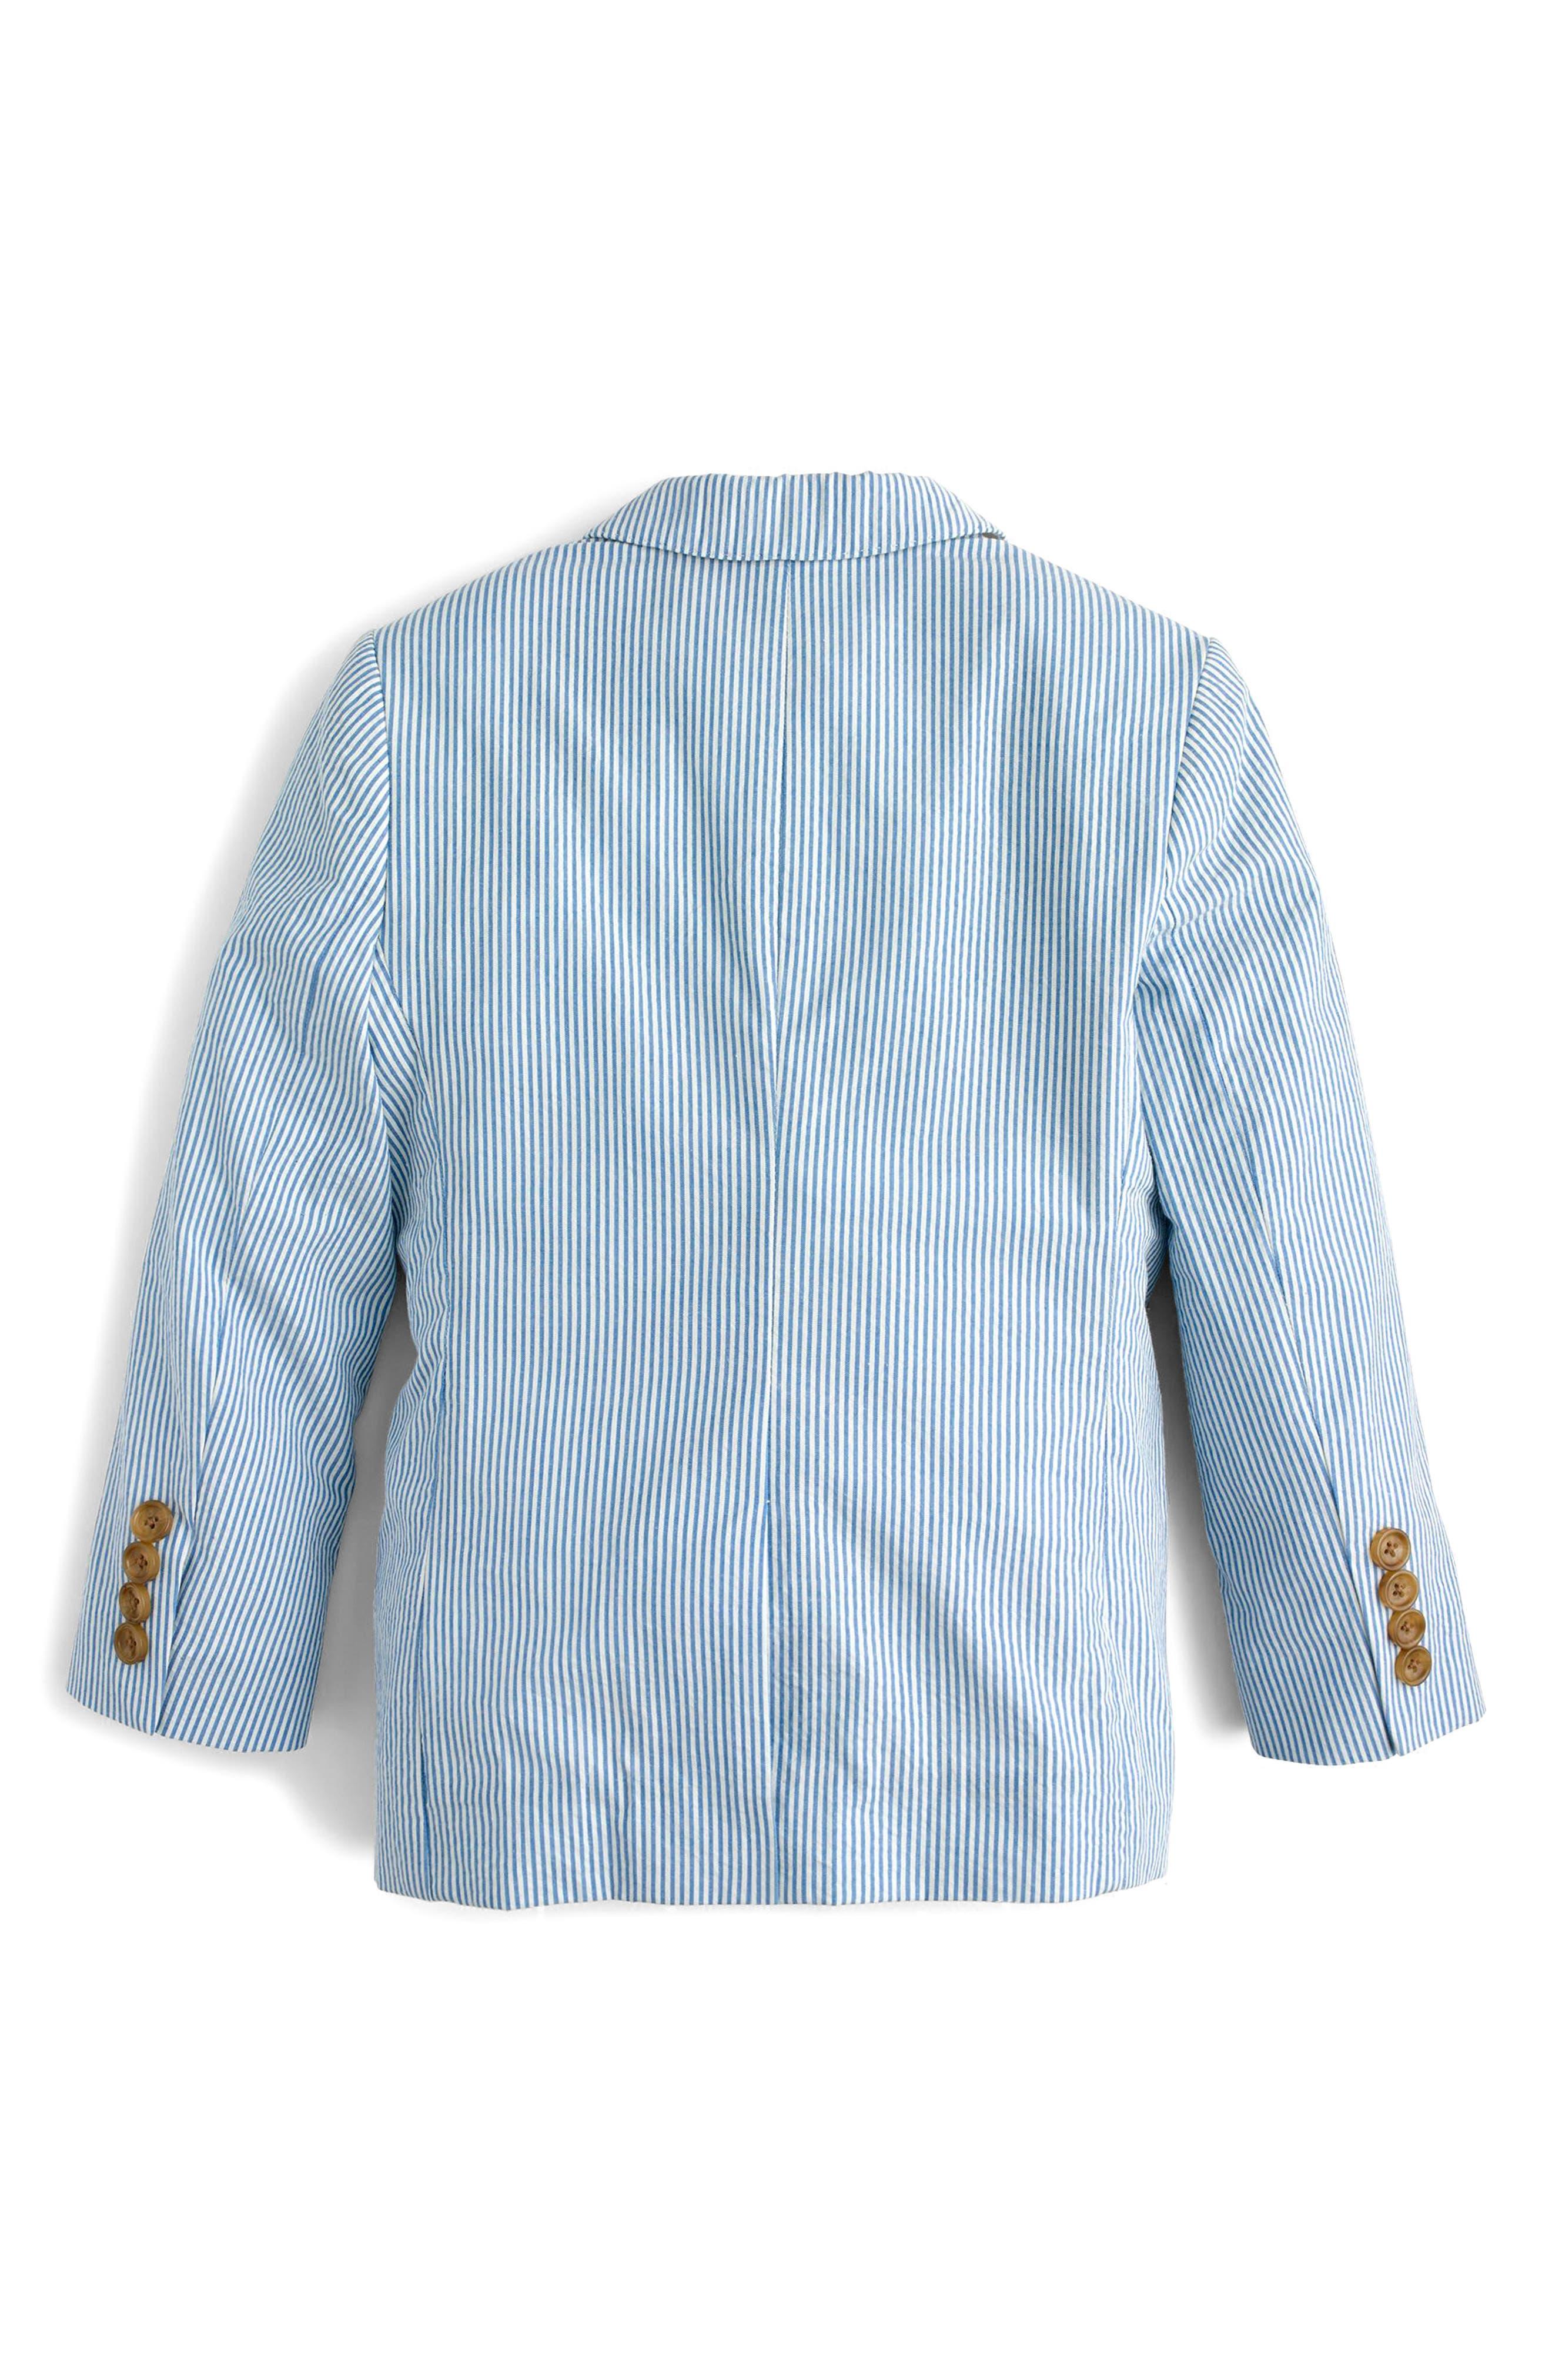 Ludlow Seersucker Suit Jacket,                             Alternate thumbnail 2, color,                             Crisp Azure White